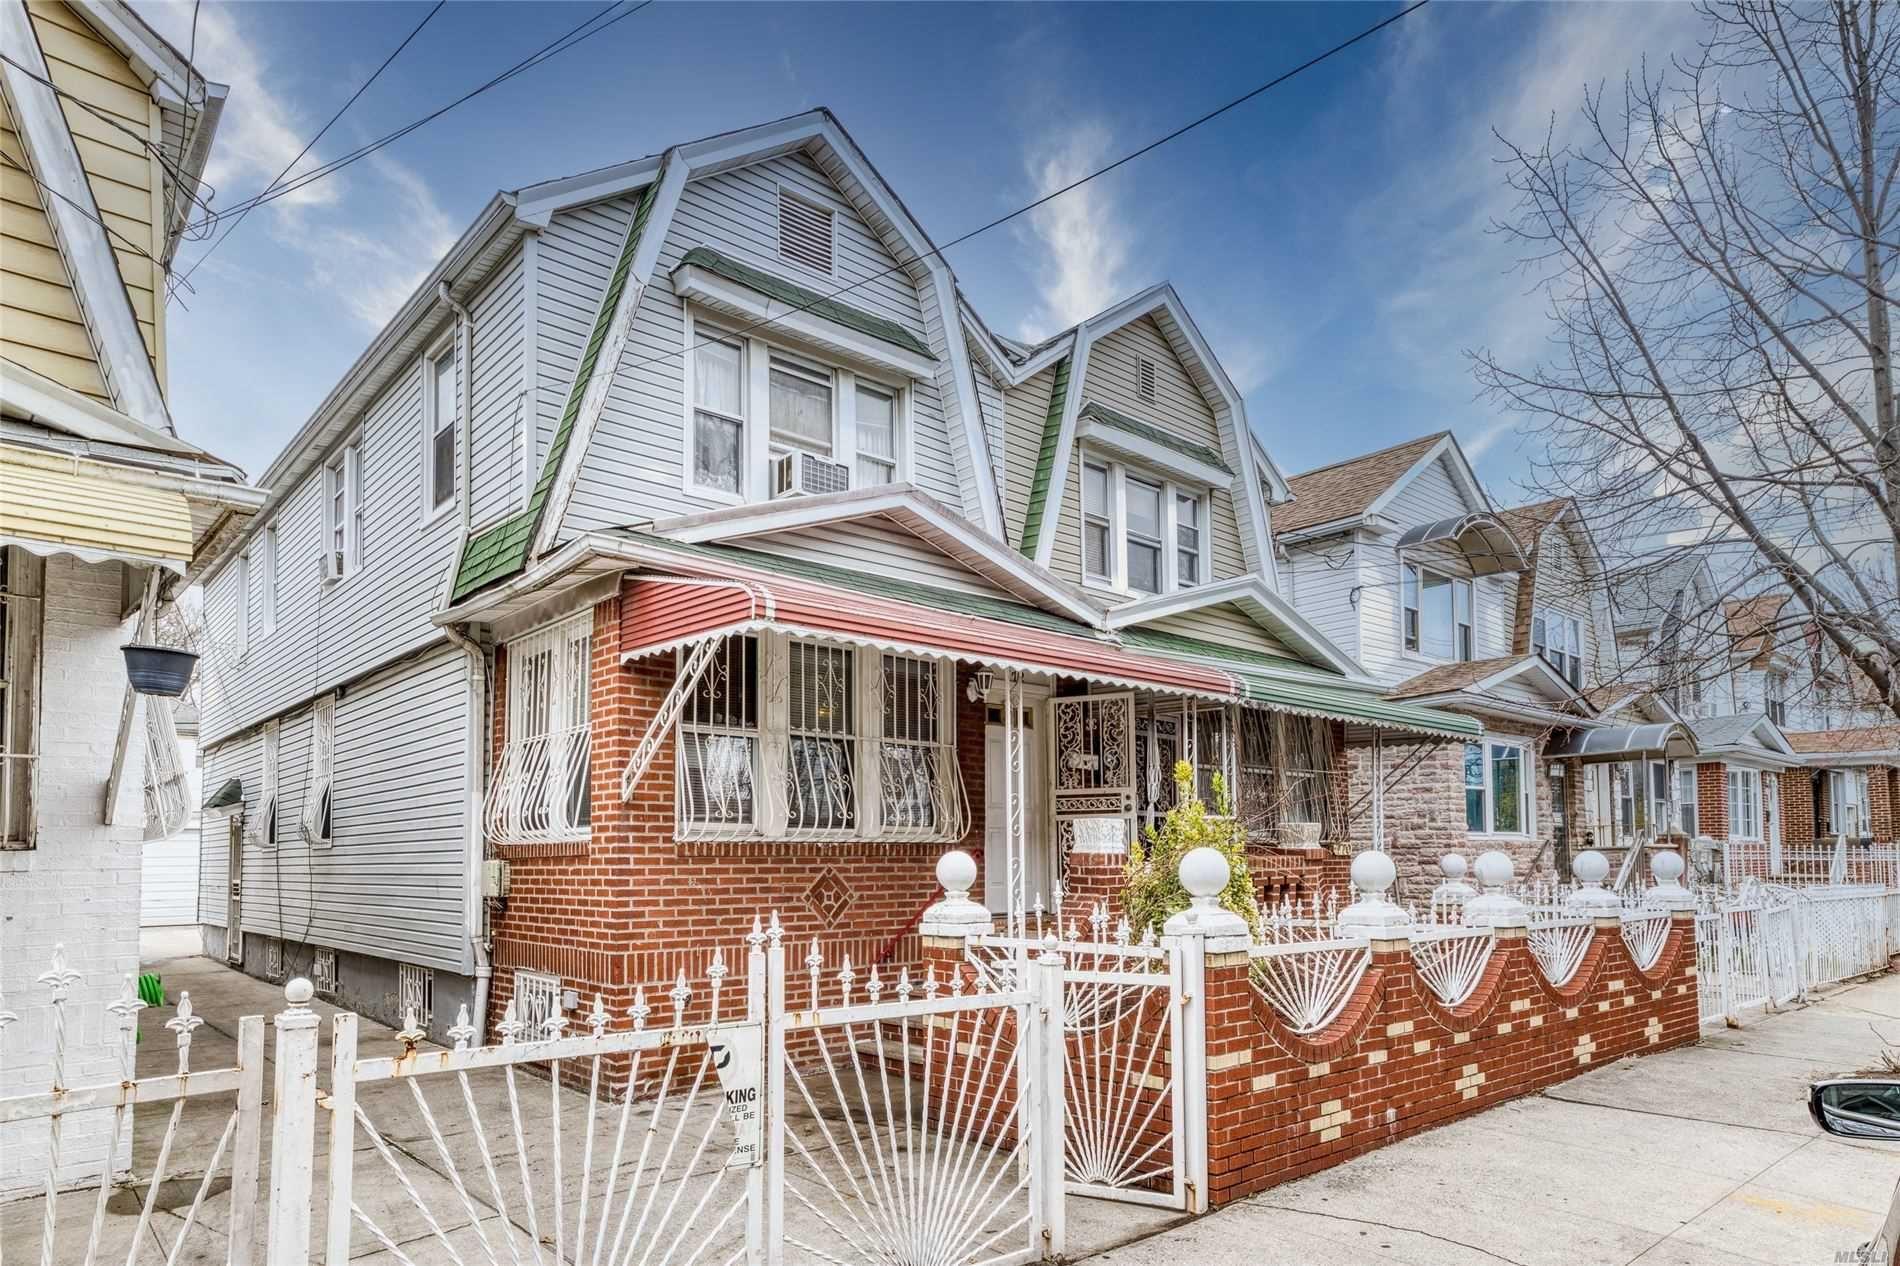 772 E 48th St, East Flatbush, NY 11203 - MLS#: 3209884